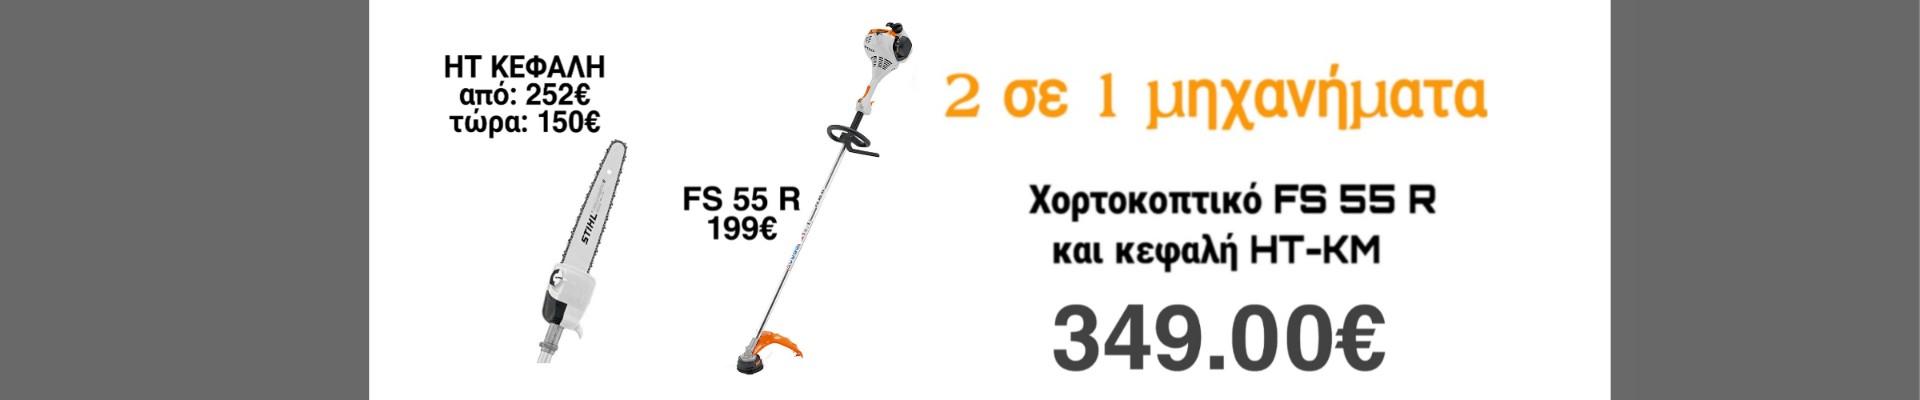 STIHL Βενζινοκίνητο Θαμνοκοπτικό FS 55 R και HT-KM + 2ο κοπτικό χλοοκόπτη